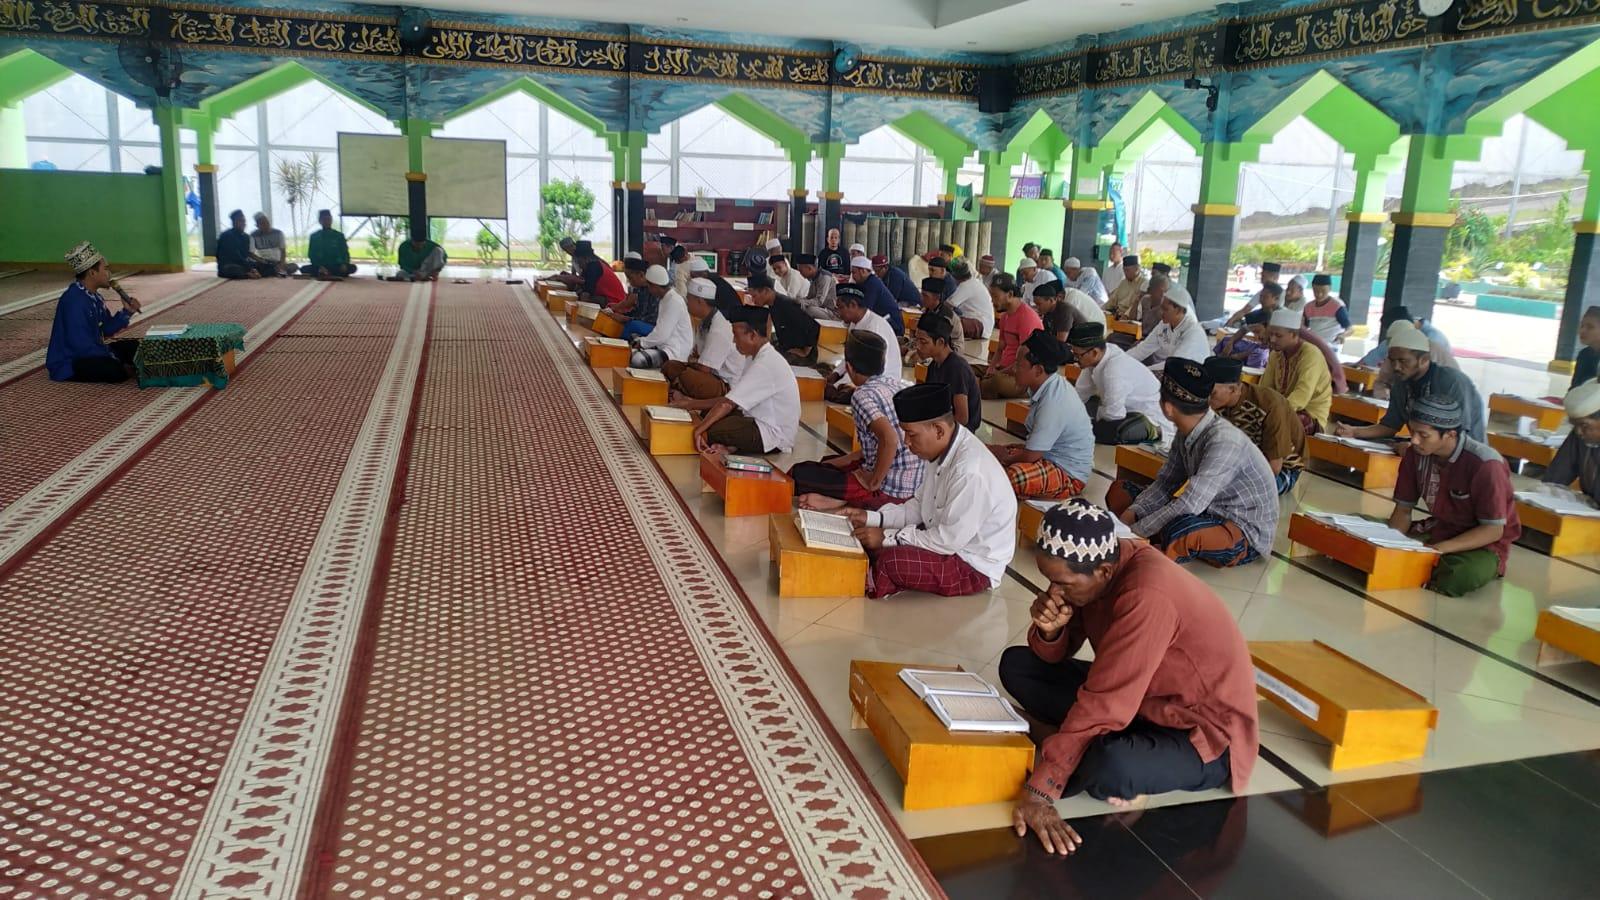 Gambar Warga Binaan Pemasyarakat di Lapas Cilegon Rutin Gelar Peka Al-Qur'an di Masjid Lapas Cilegon 1